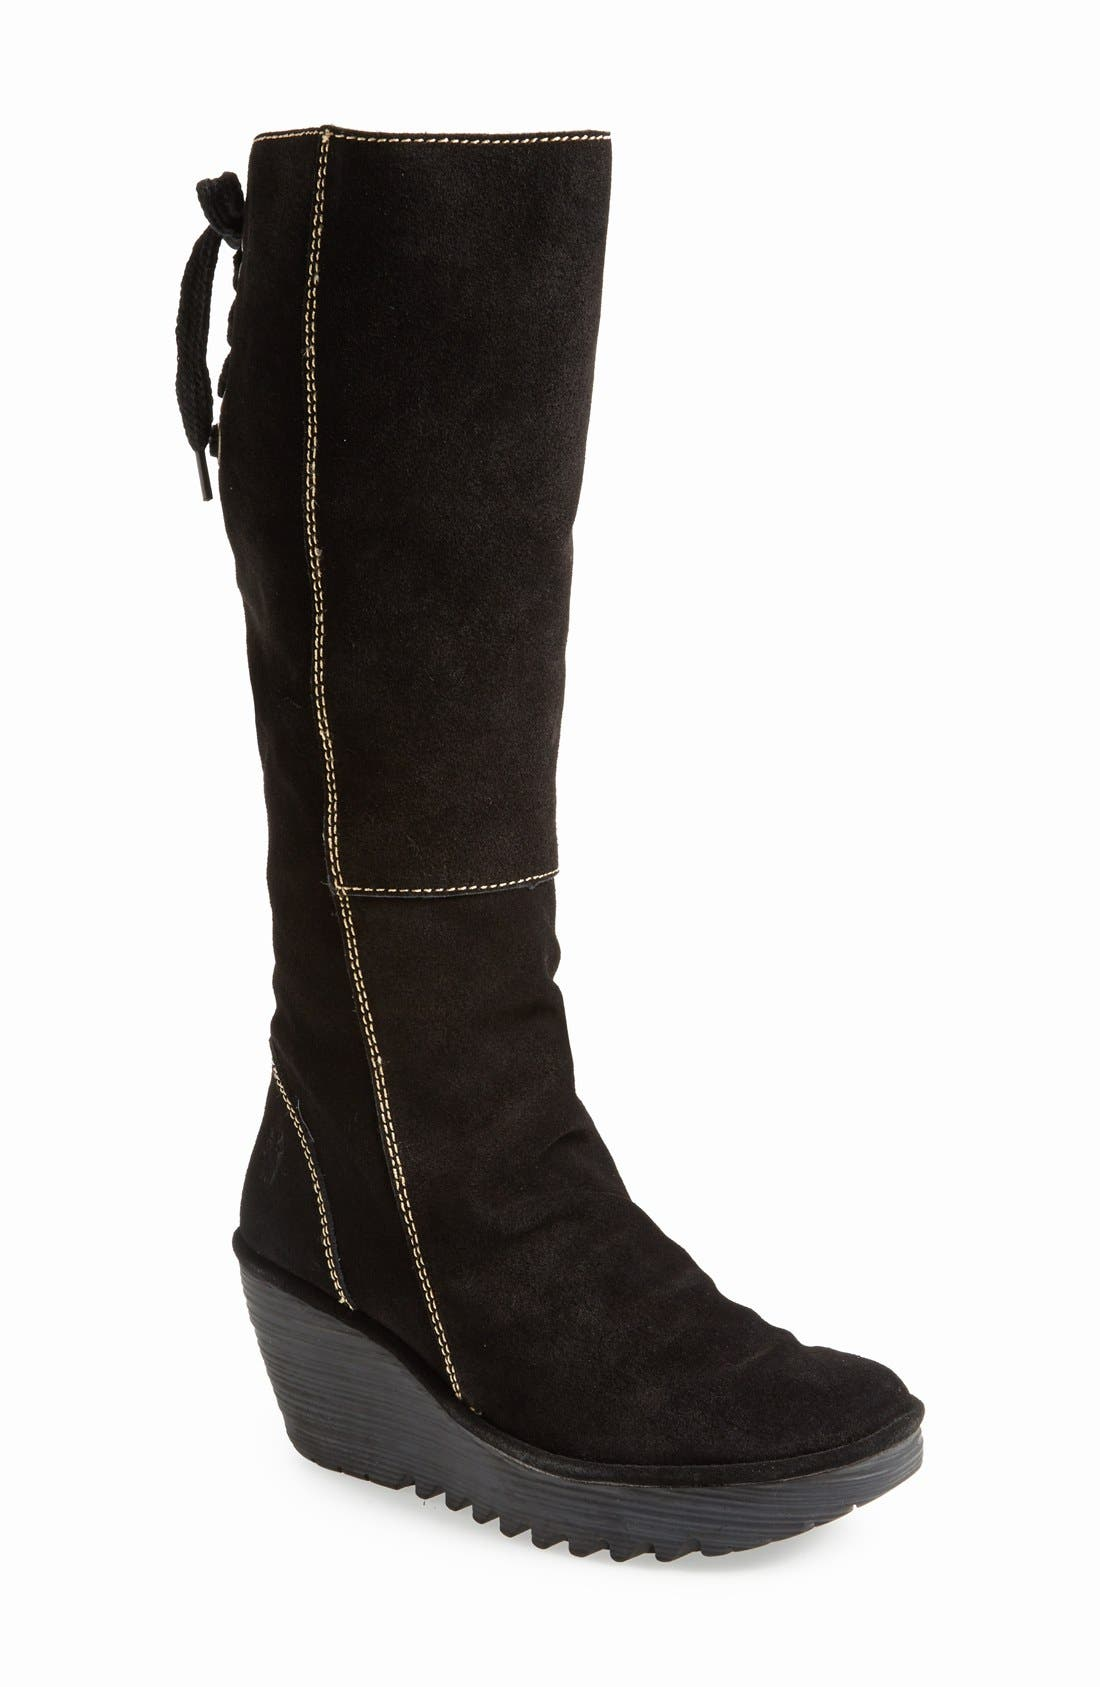 Main Image - Fly London 'Yust' Knee High Platform Wedge Boot (Women)